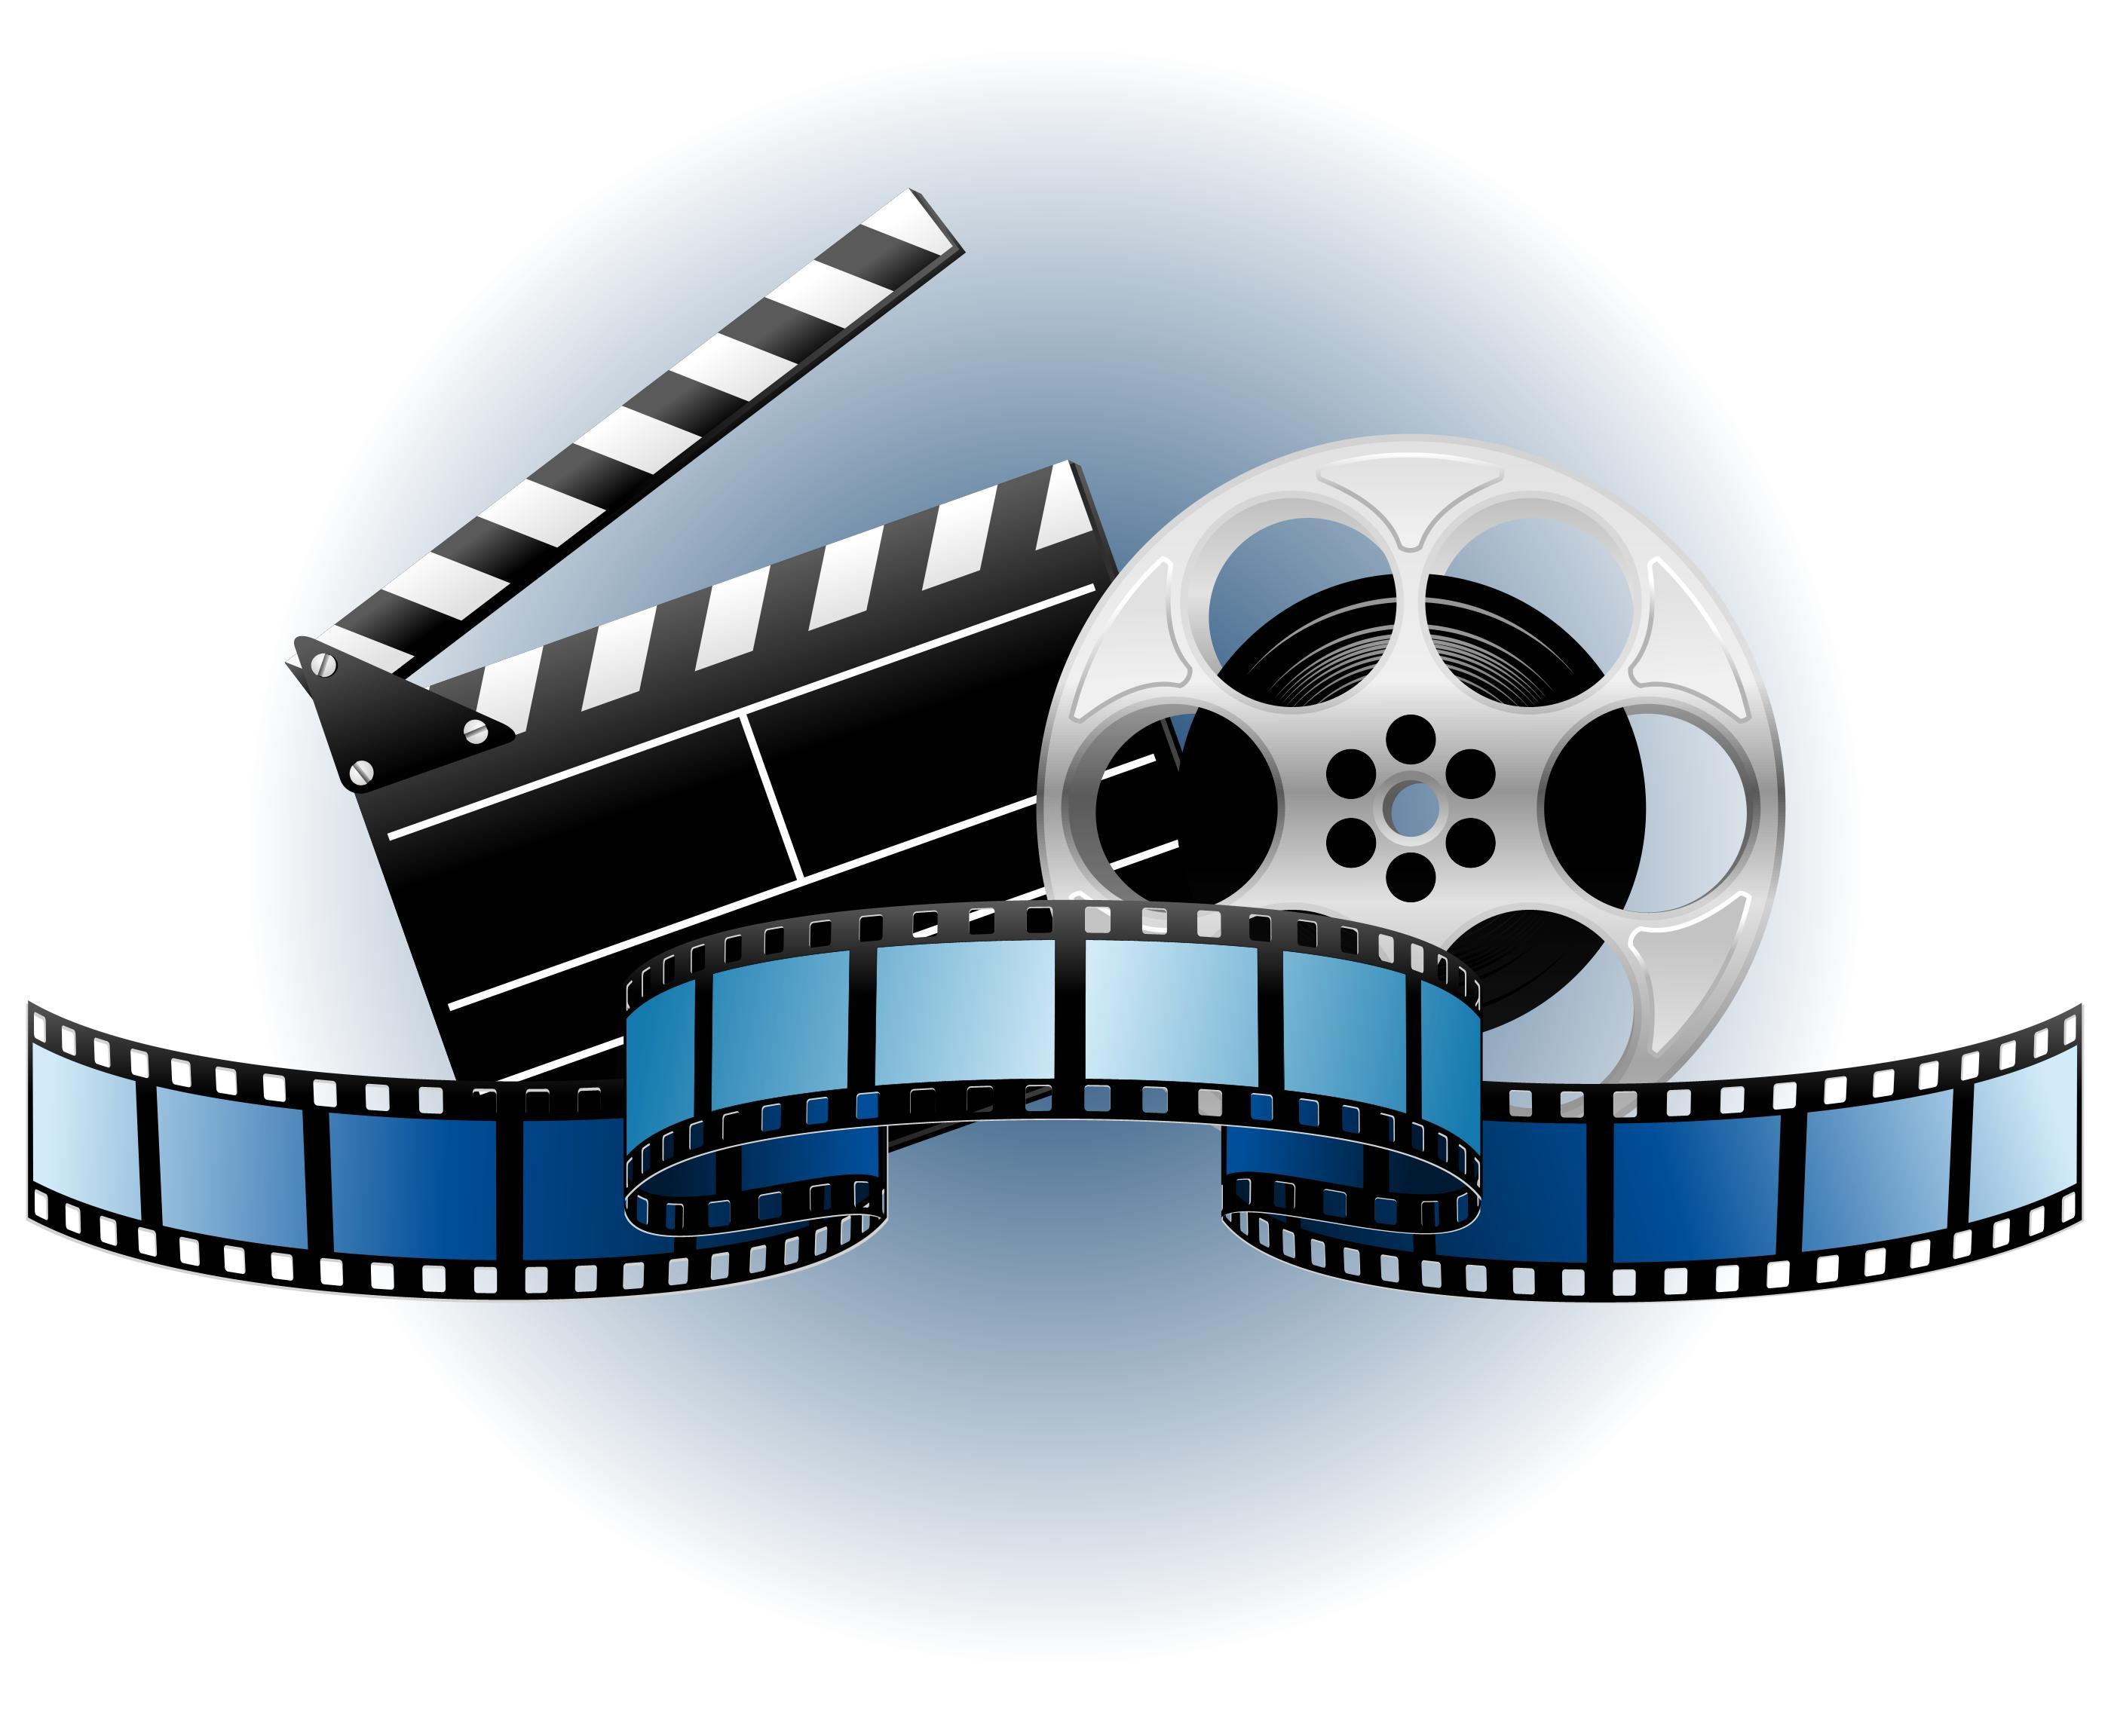 Exploring the .NET CoreFX Part 17: Videotaped API Review